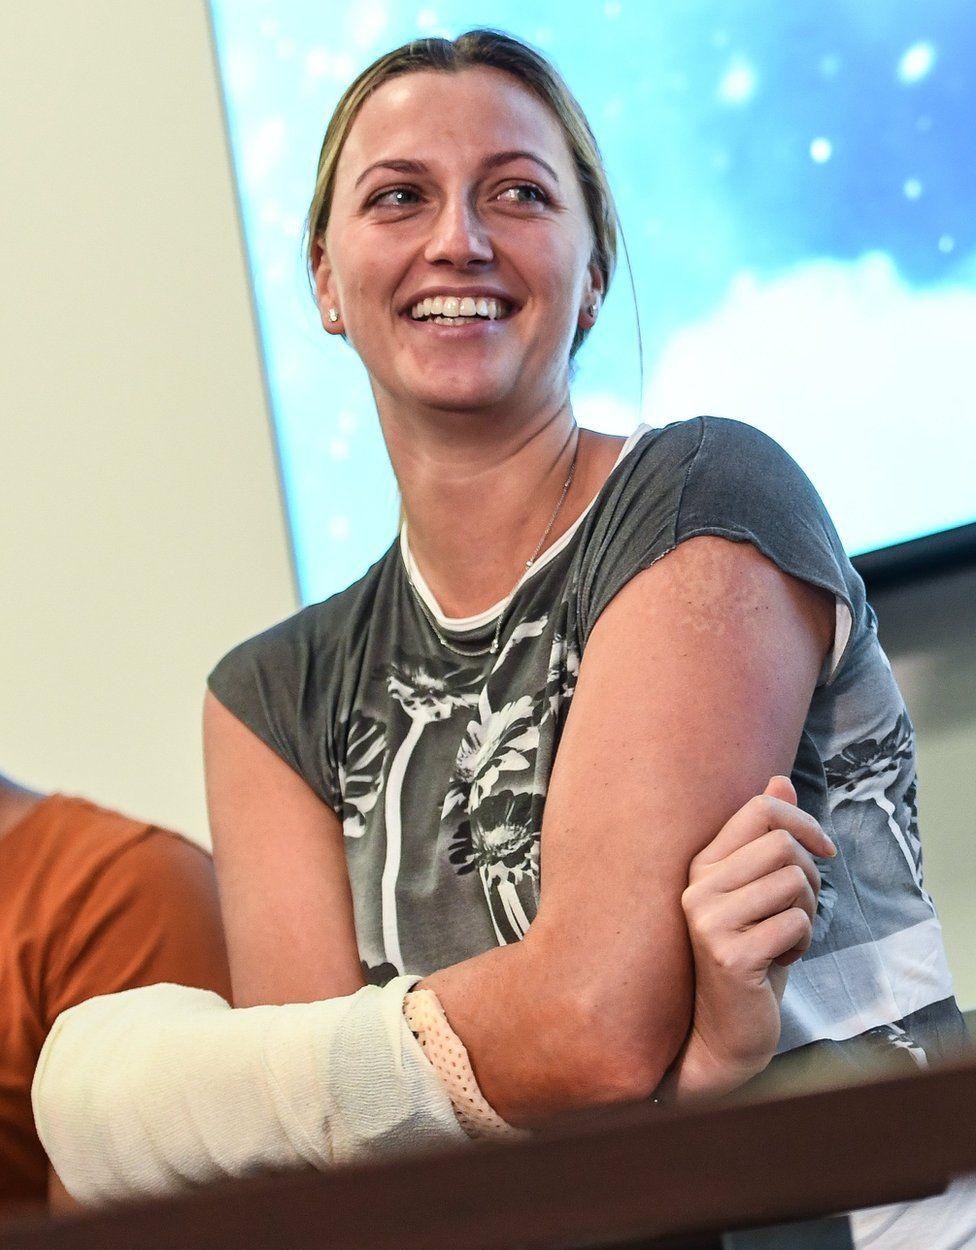 Petra Kvitova after the attack